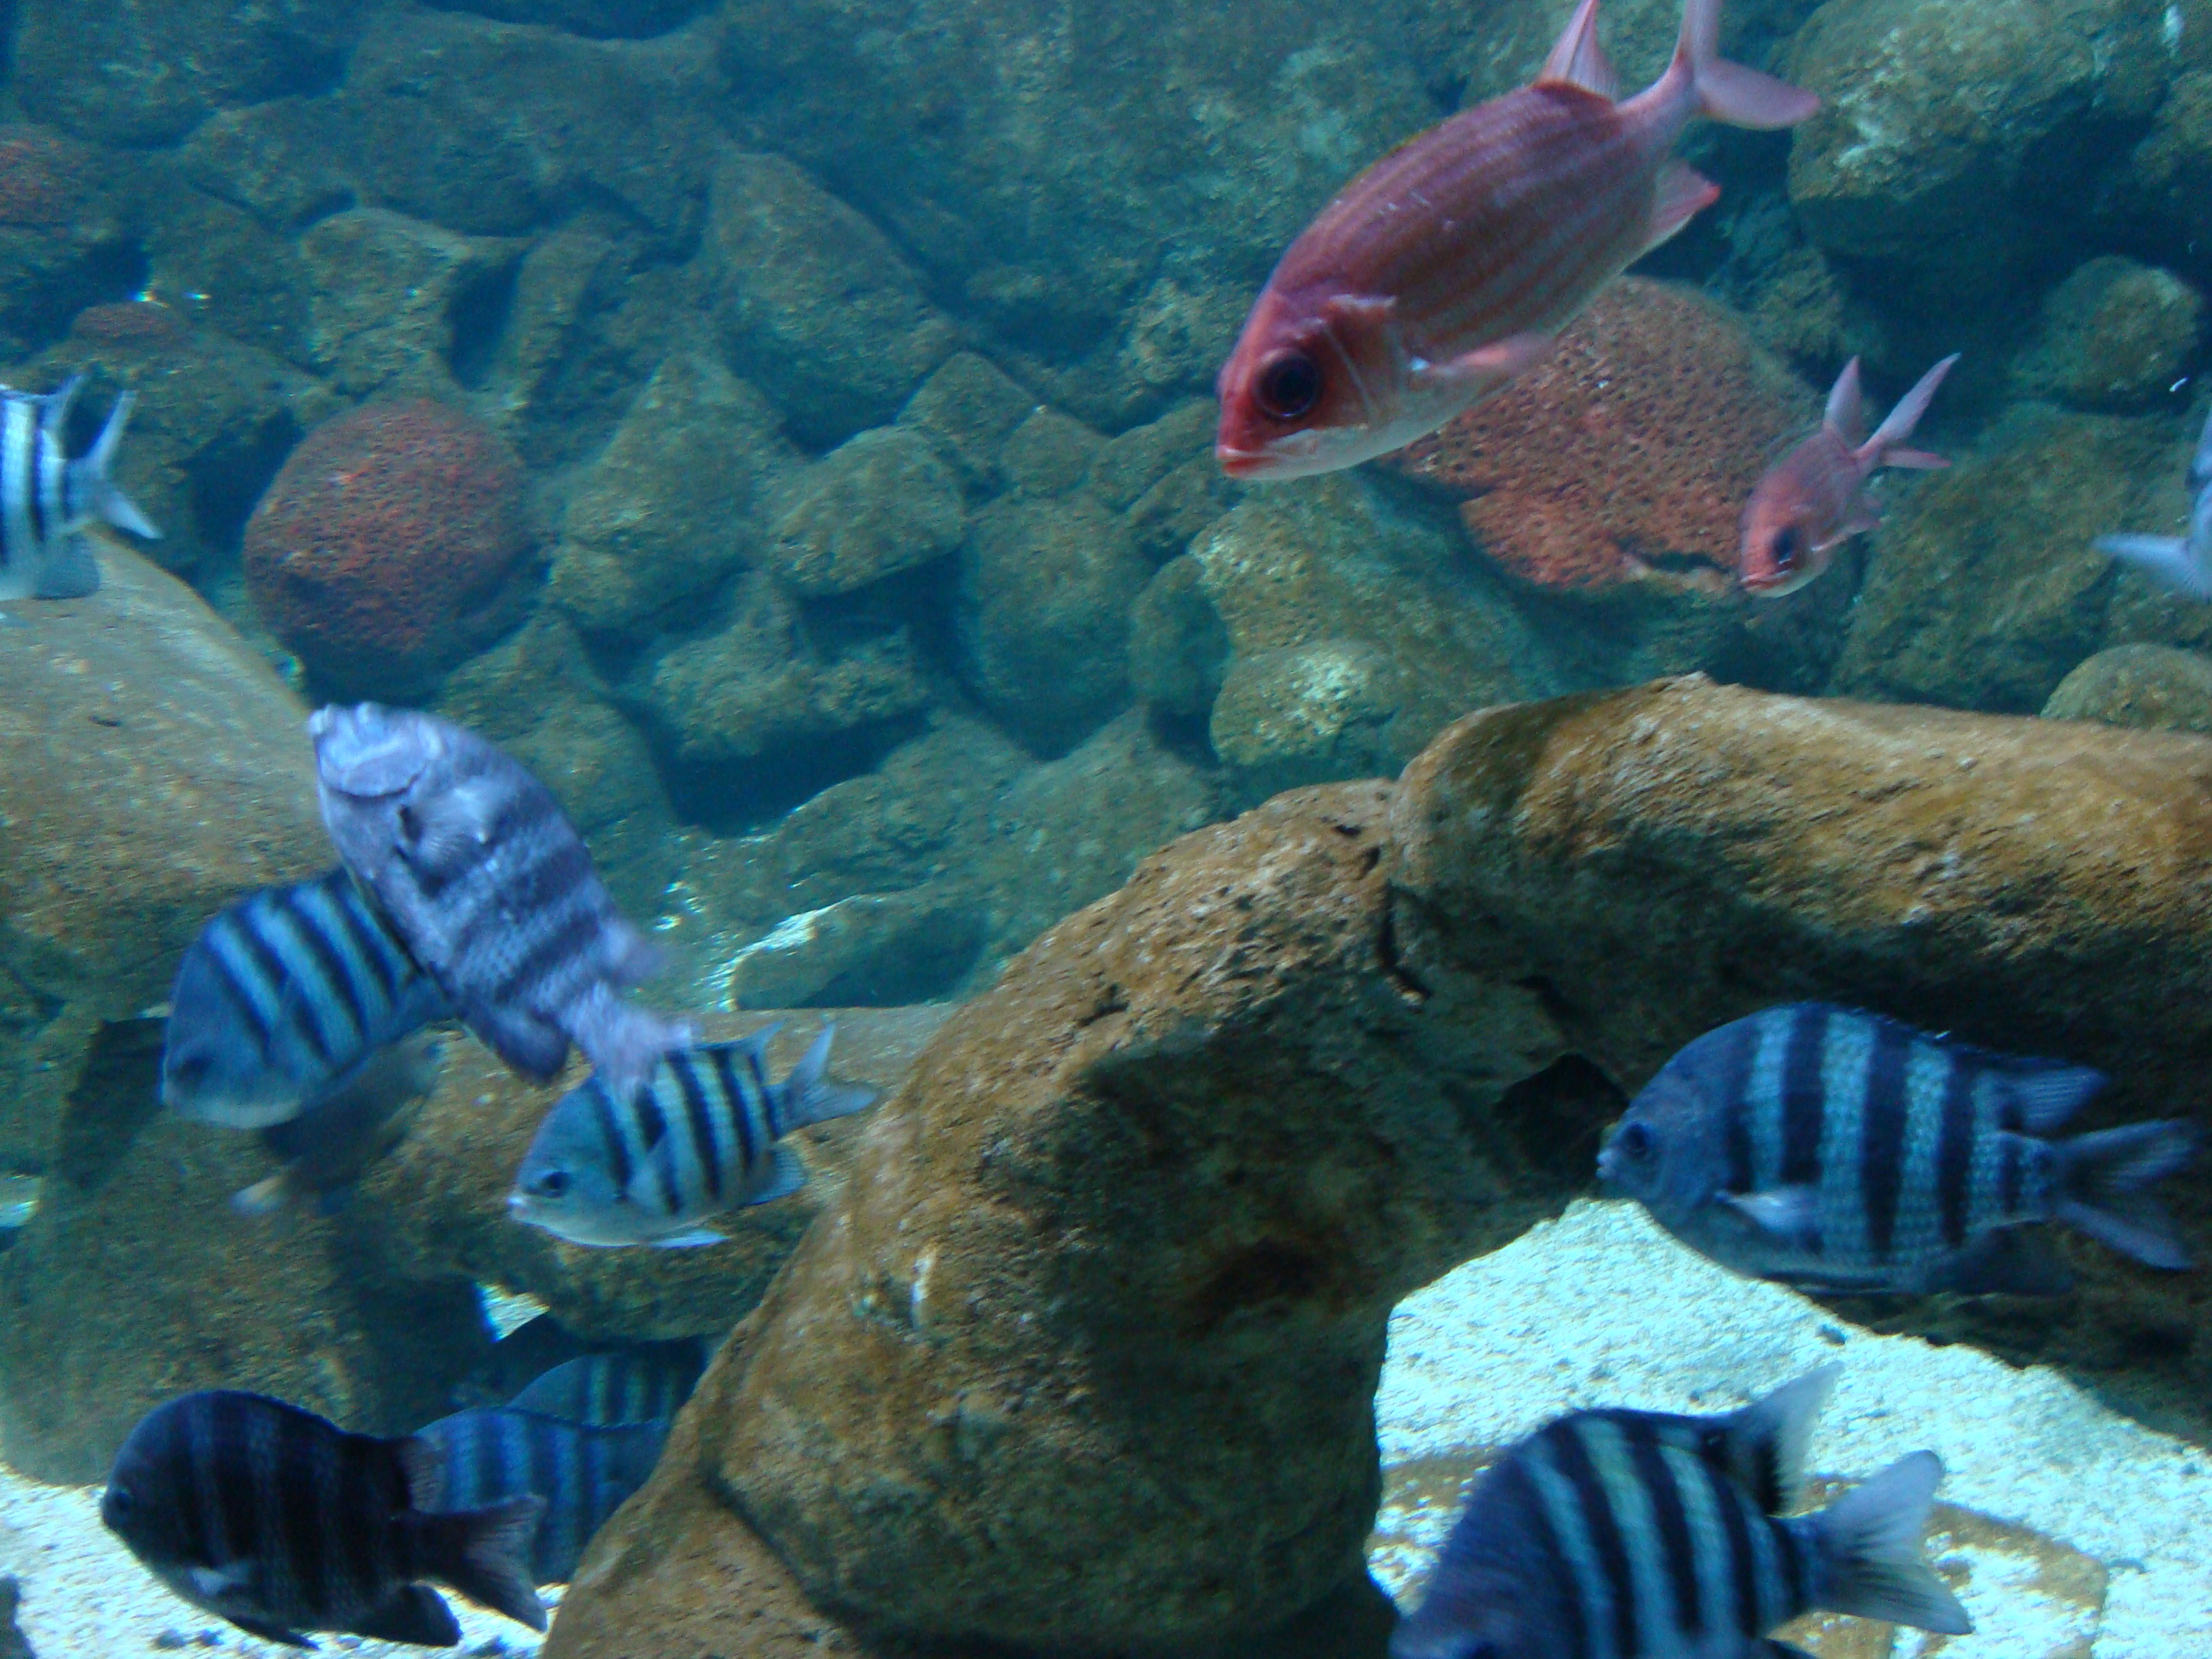 File:Aquario de sao paulo2.JPG - Wikimedia Commons